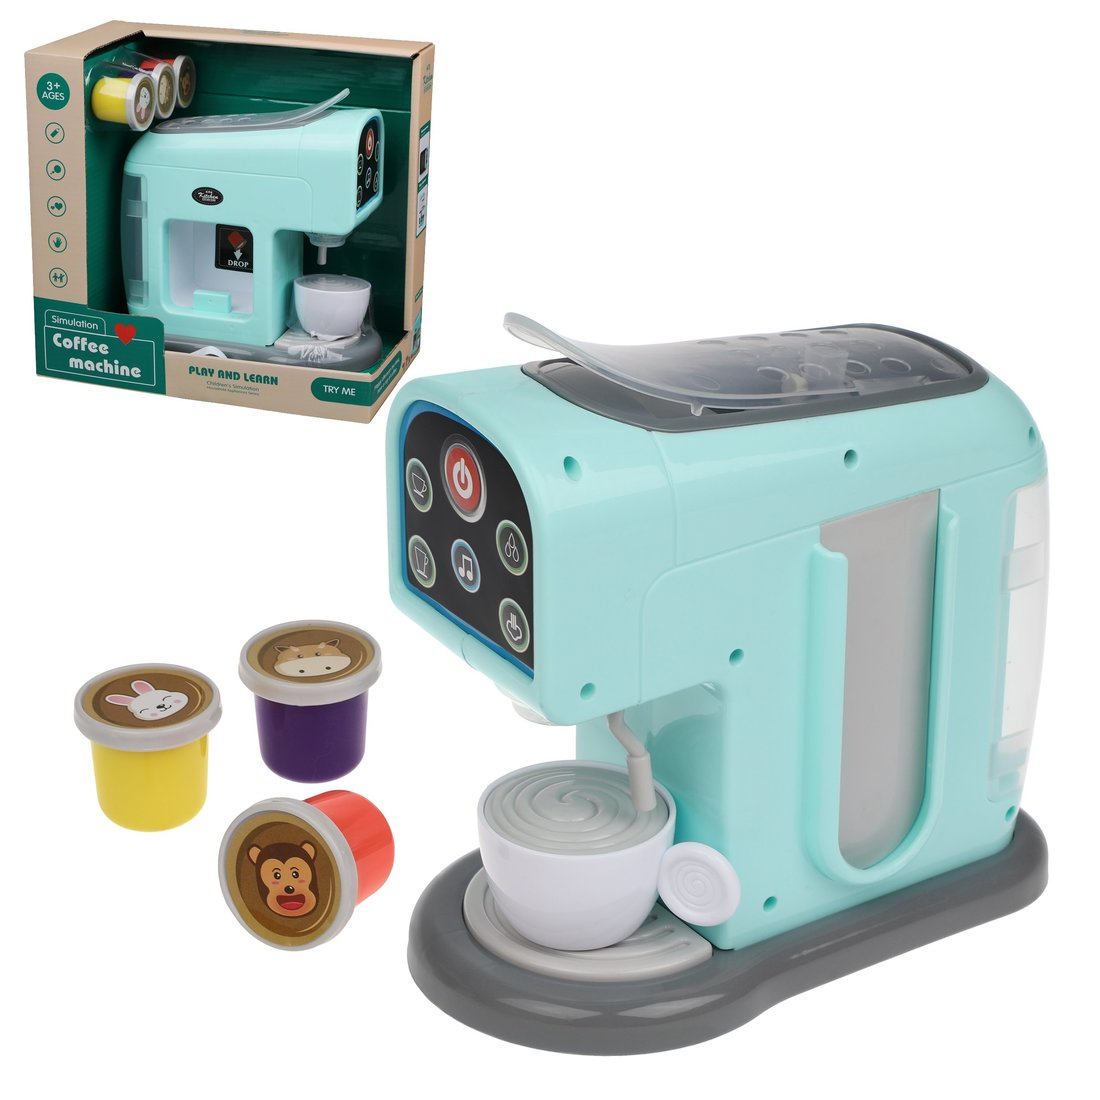 Кухонная техника Наша Игрушка 4 предмета, свет, звук 998-2